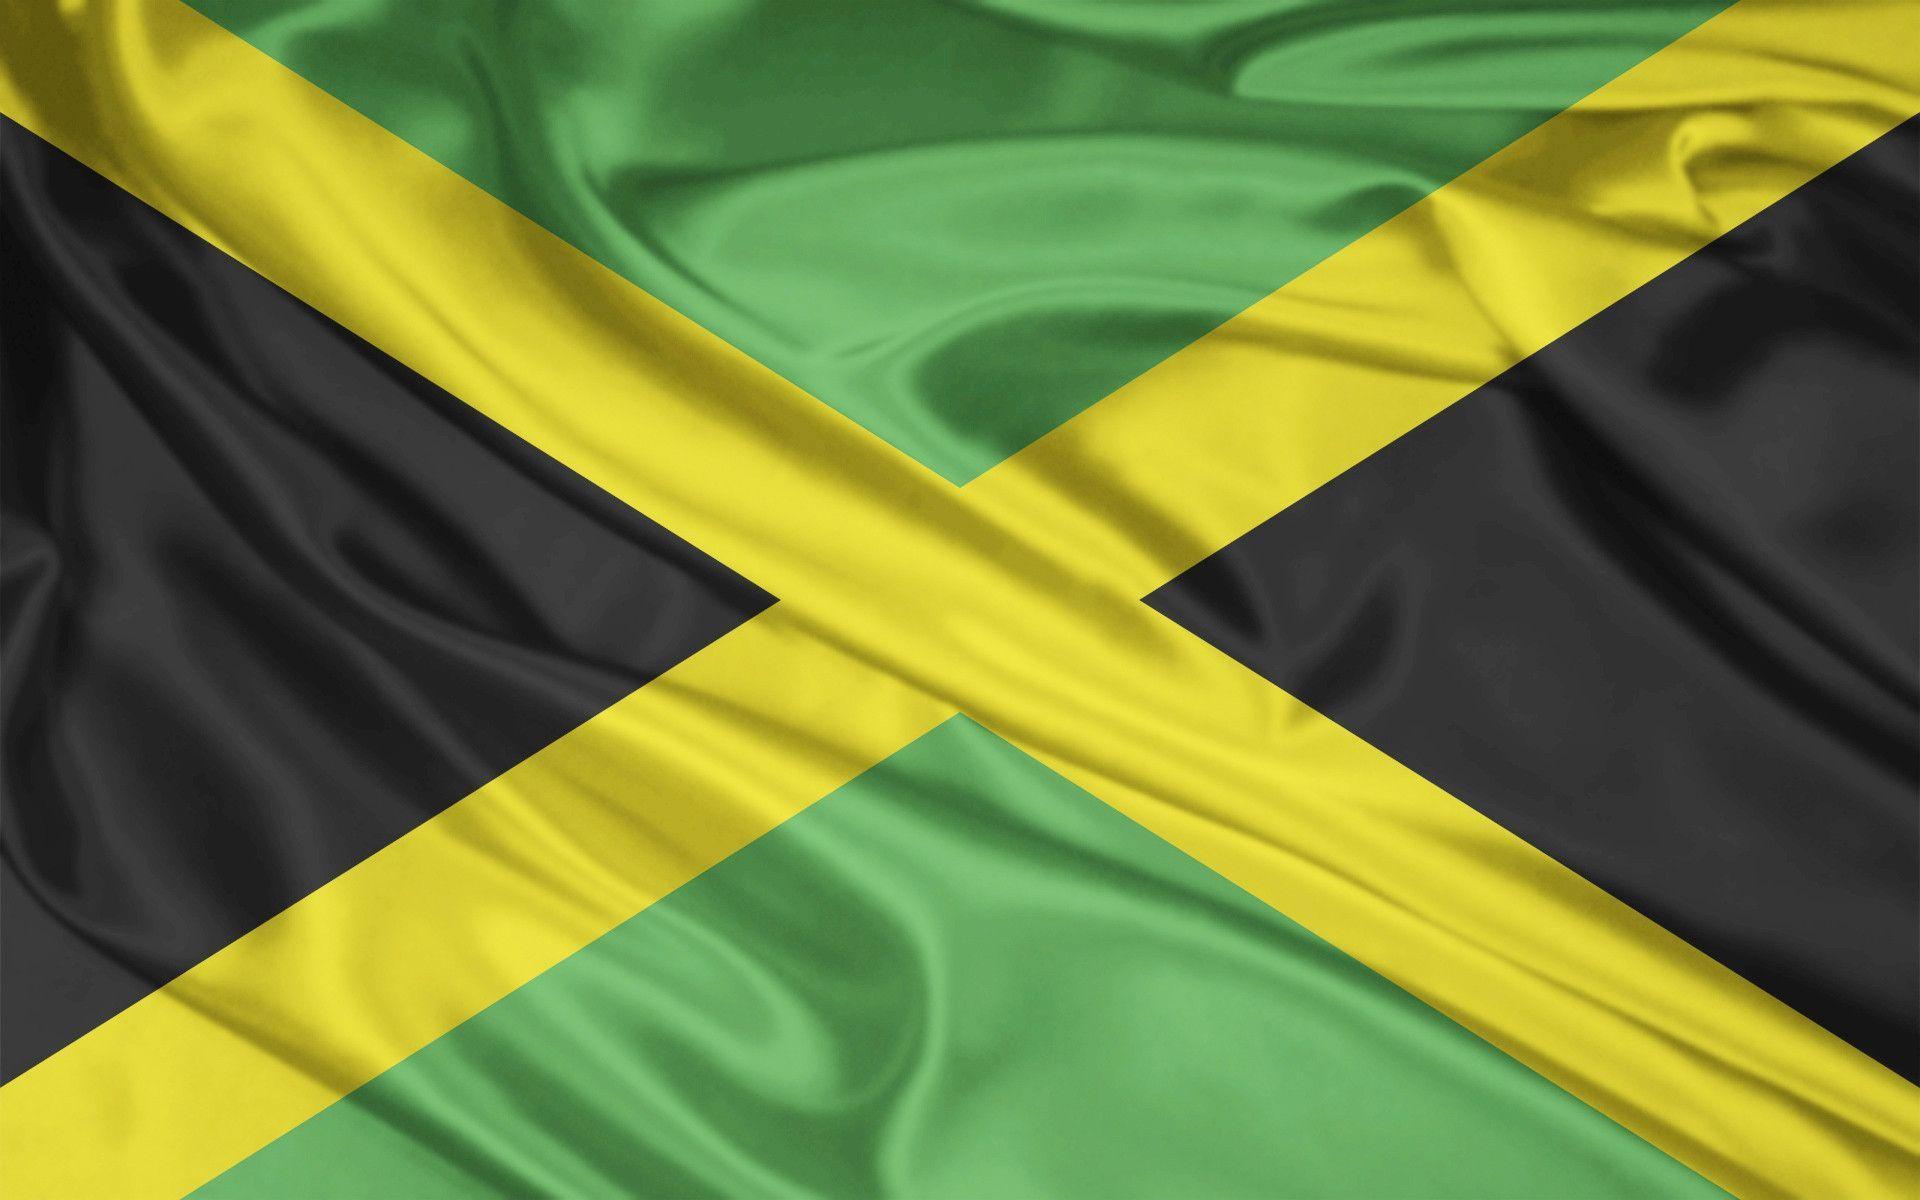 Pin 640x960 Jamaican Flag Iphone 4 Wallpaper on Pinterest